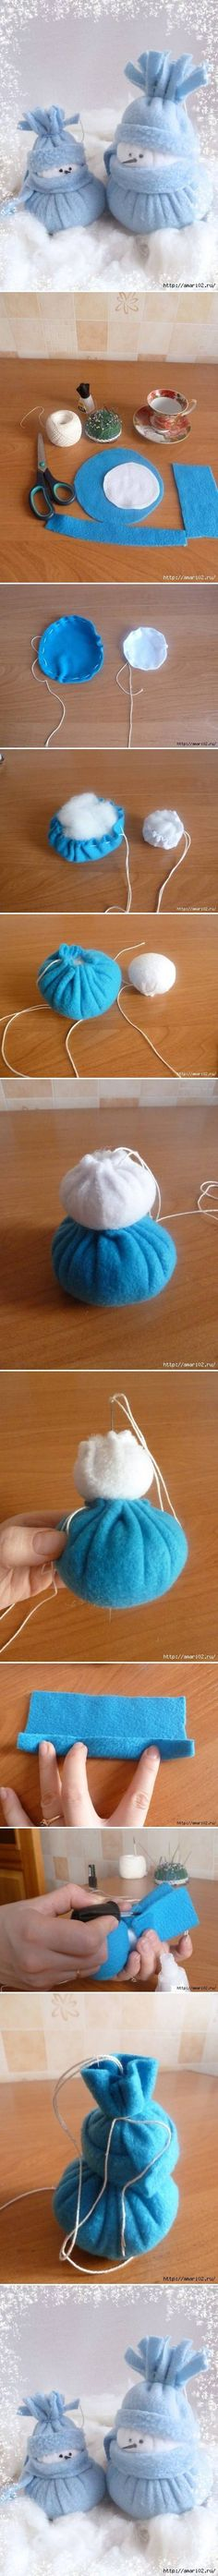 How to DIY Felt Snowman for Christmas Holiday Decor | www.FabArtDIY.com LIKE Us on Facebook ==> https://www.facebook.com/FabArtDIY